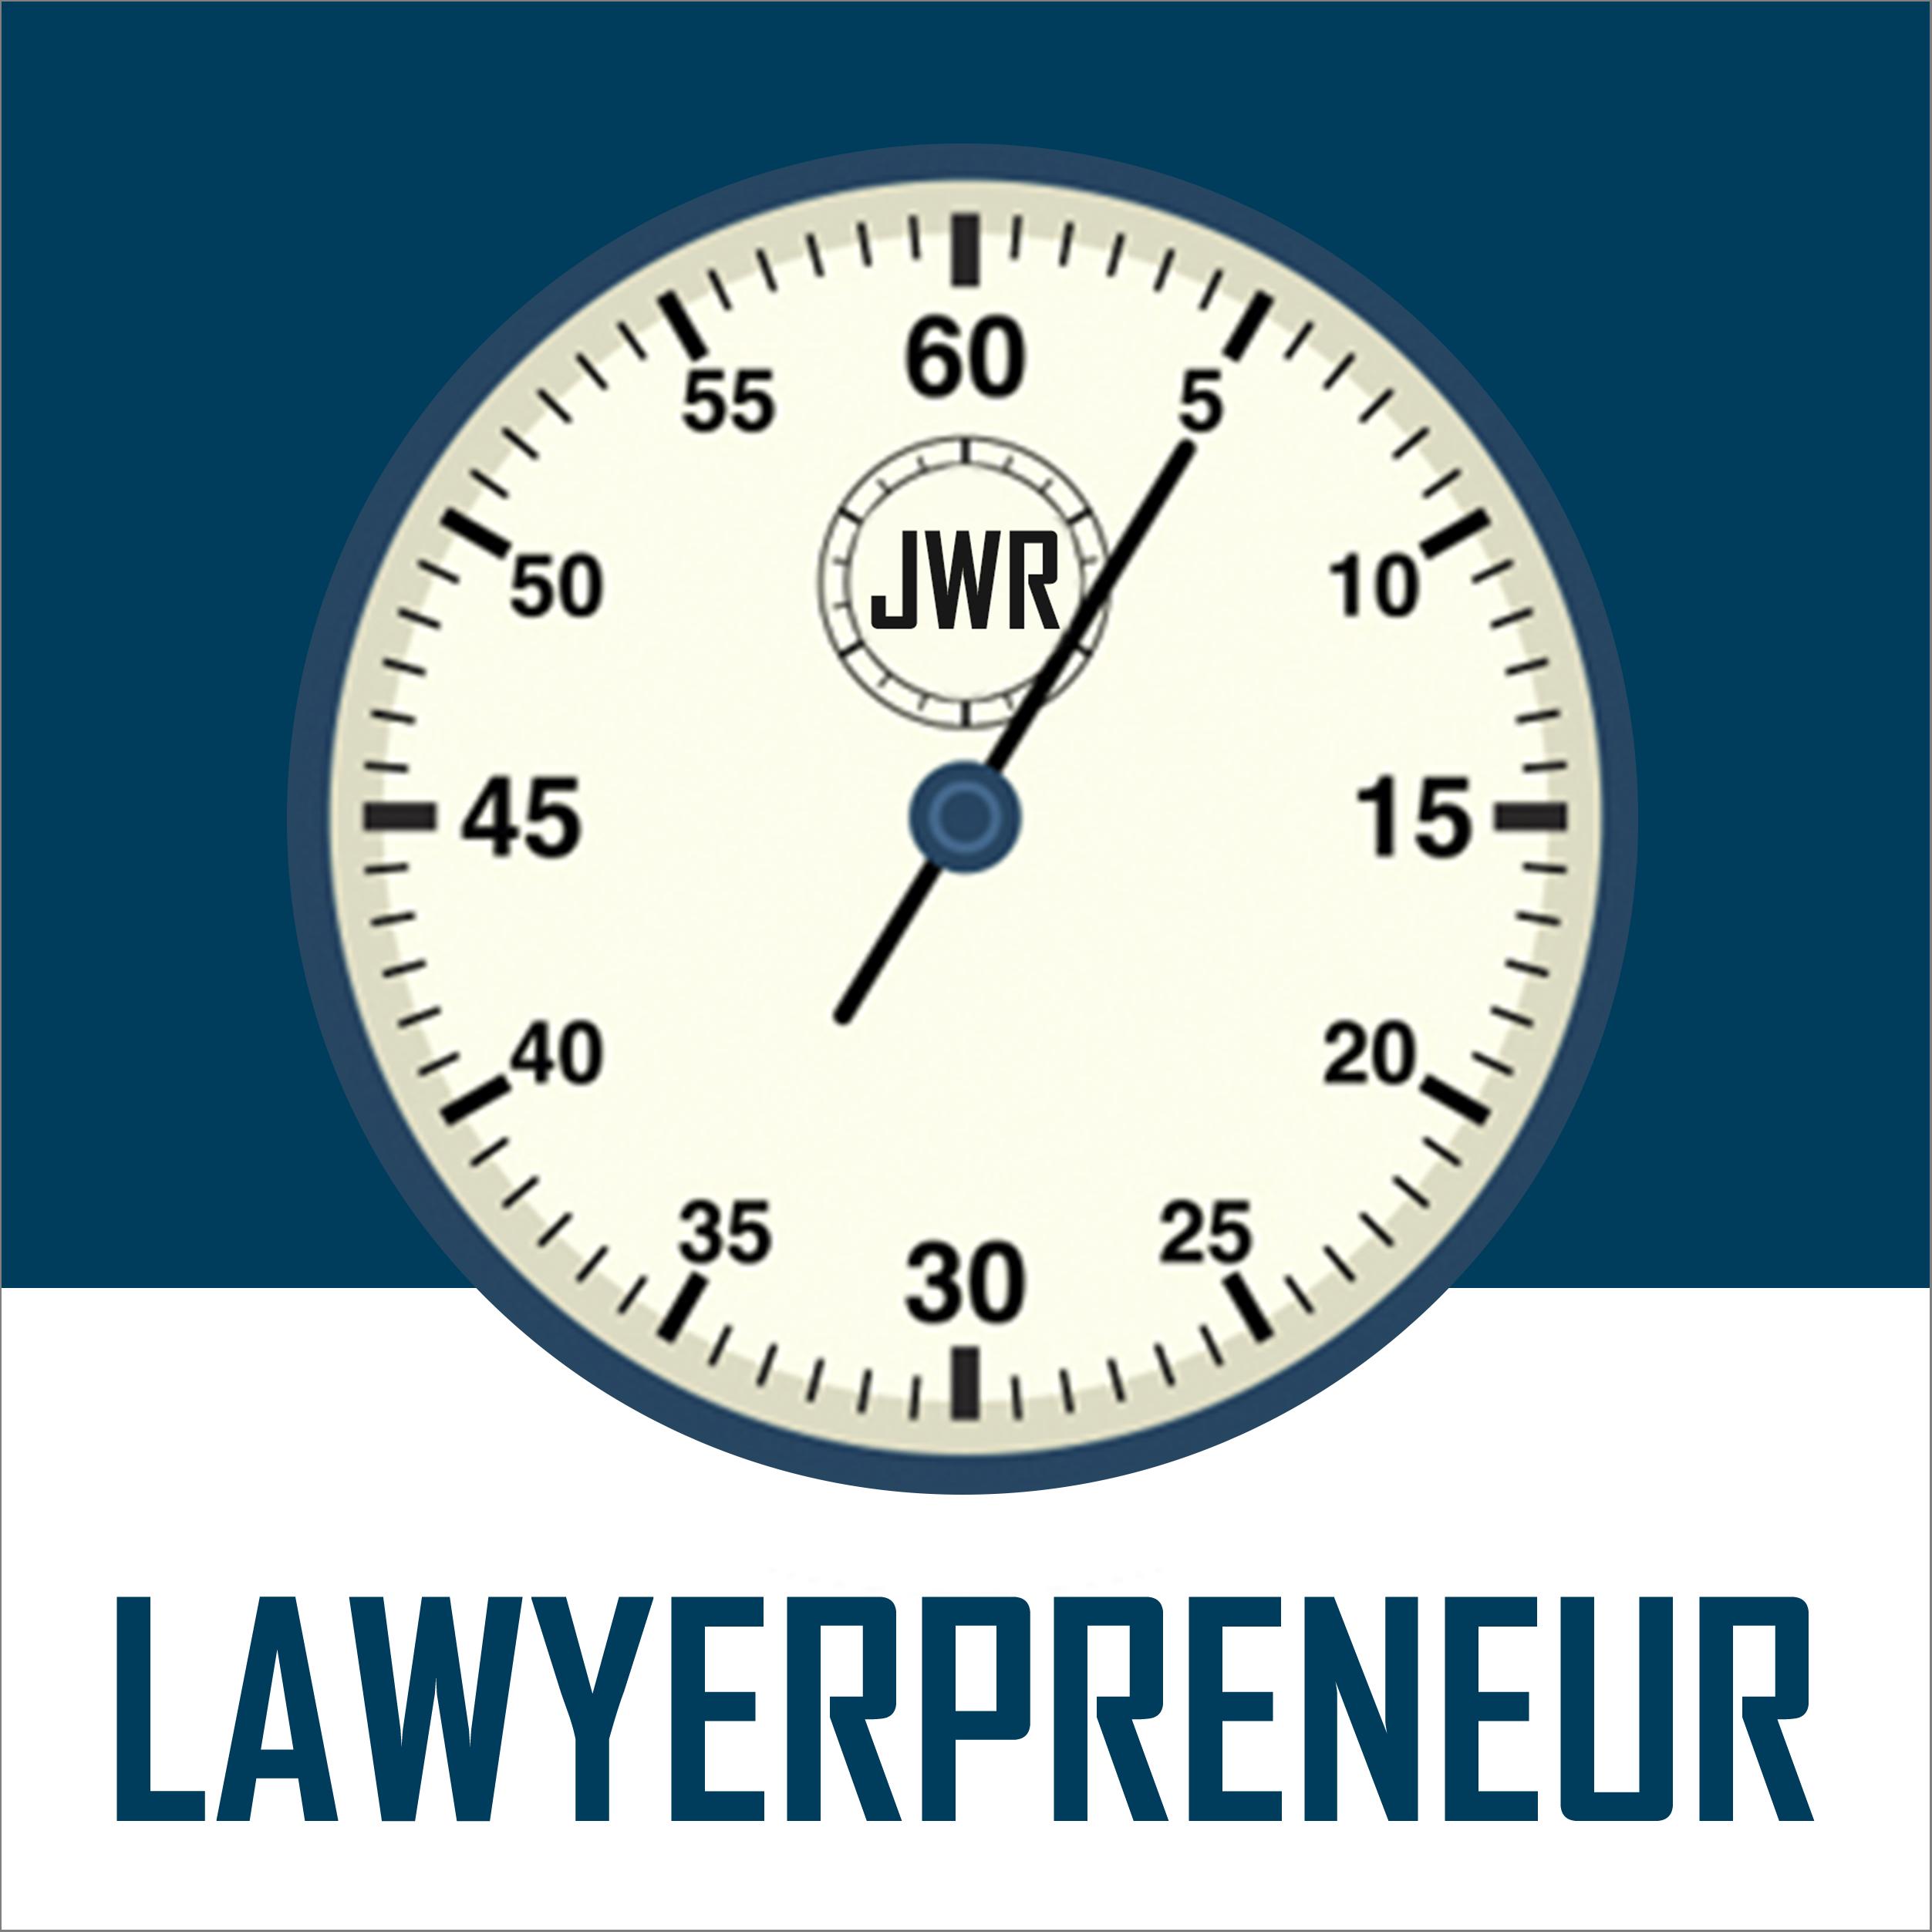 Lawyerpreneur Podcast